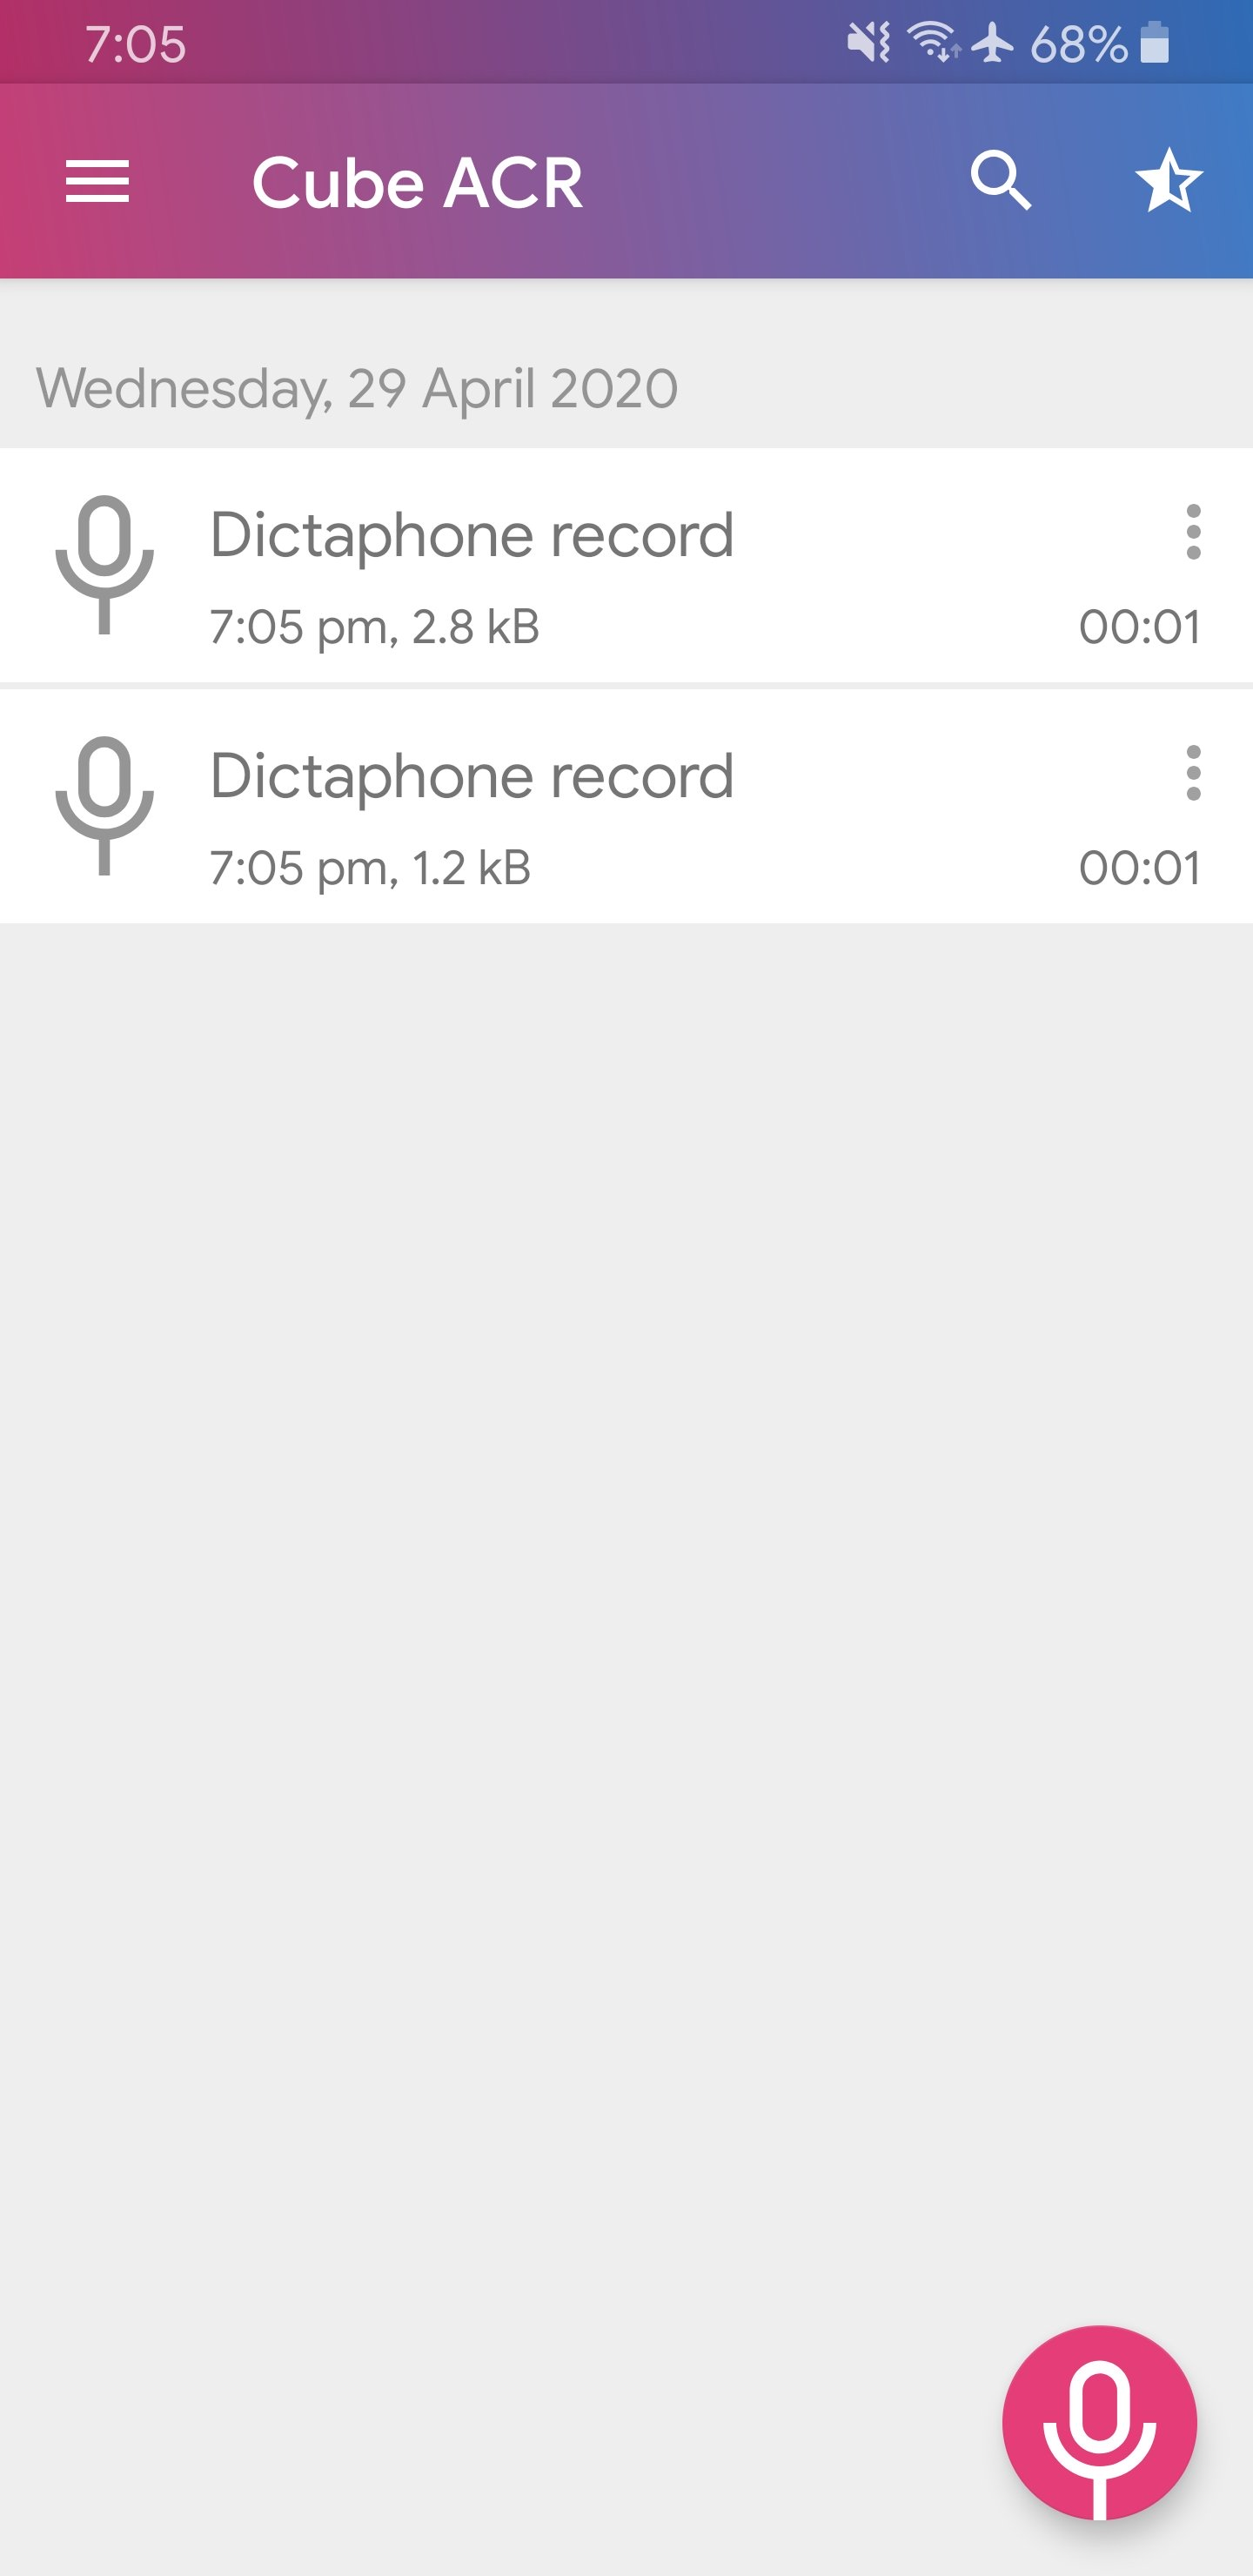 ضبط مکالمات تصویری واتساپ